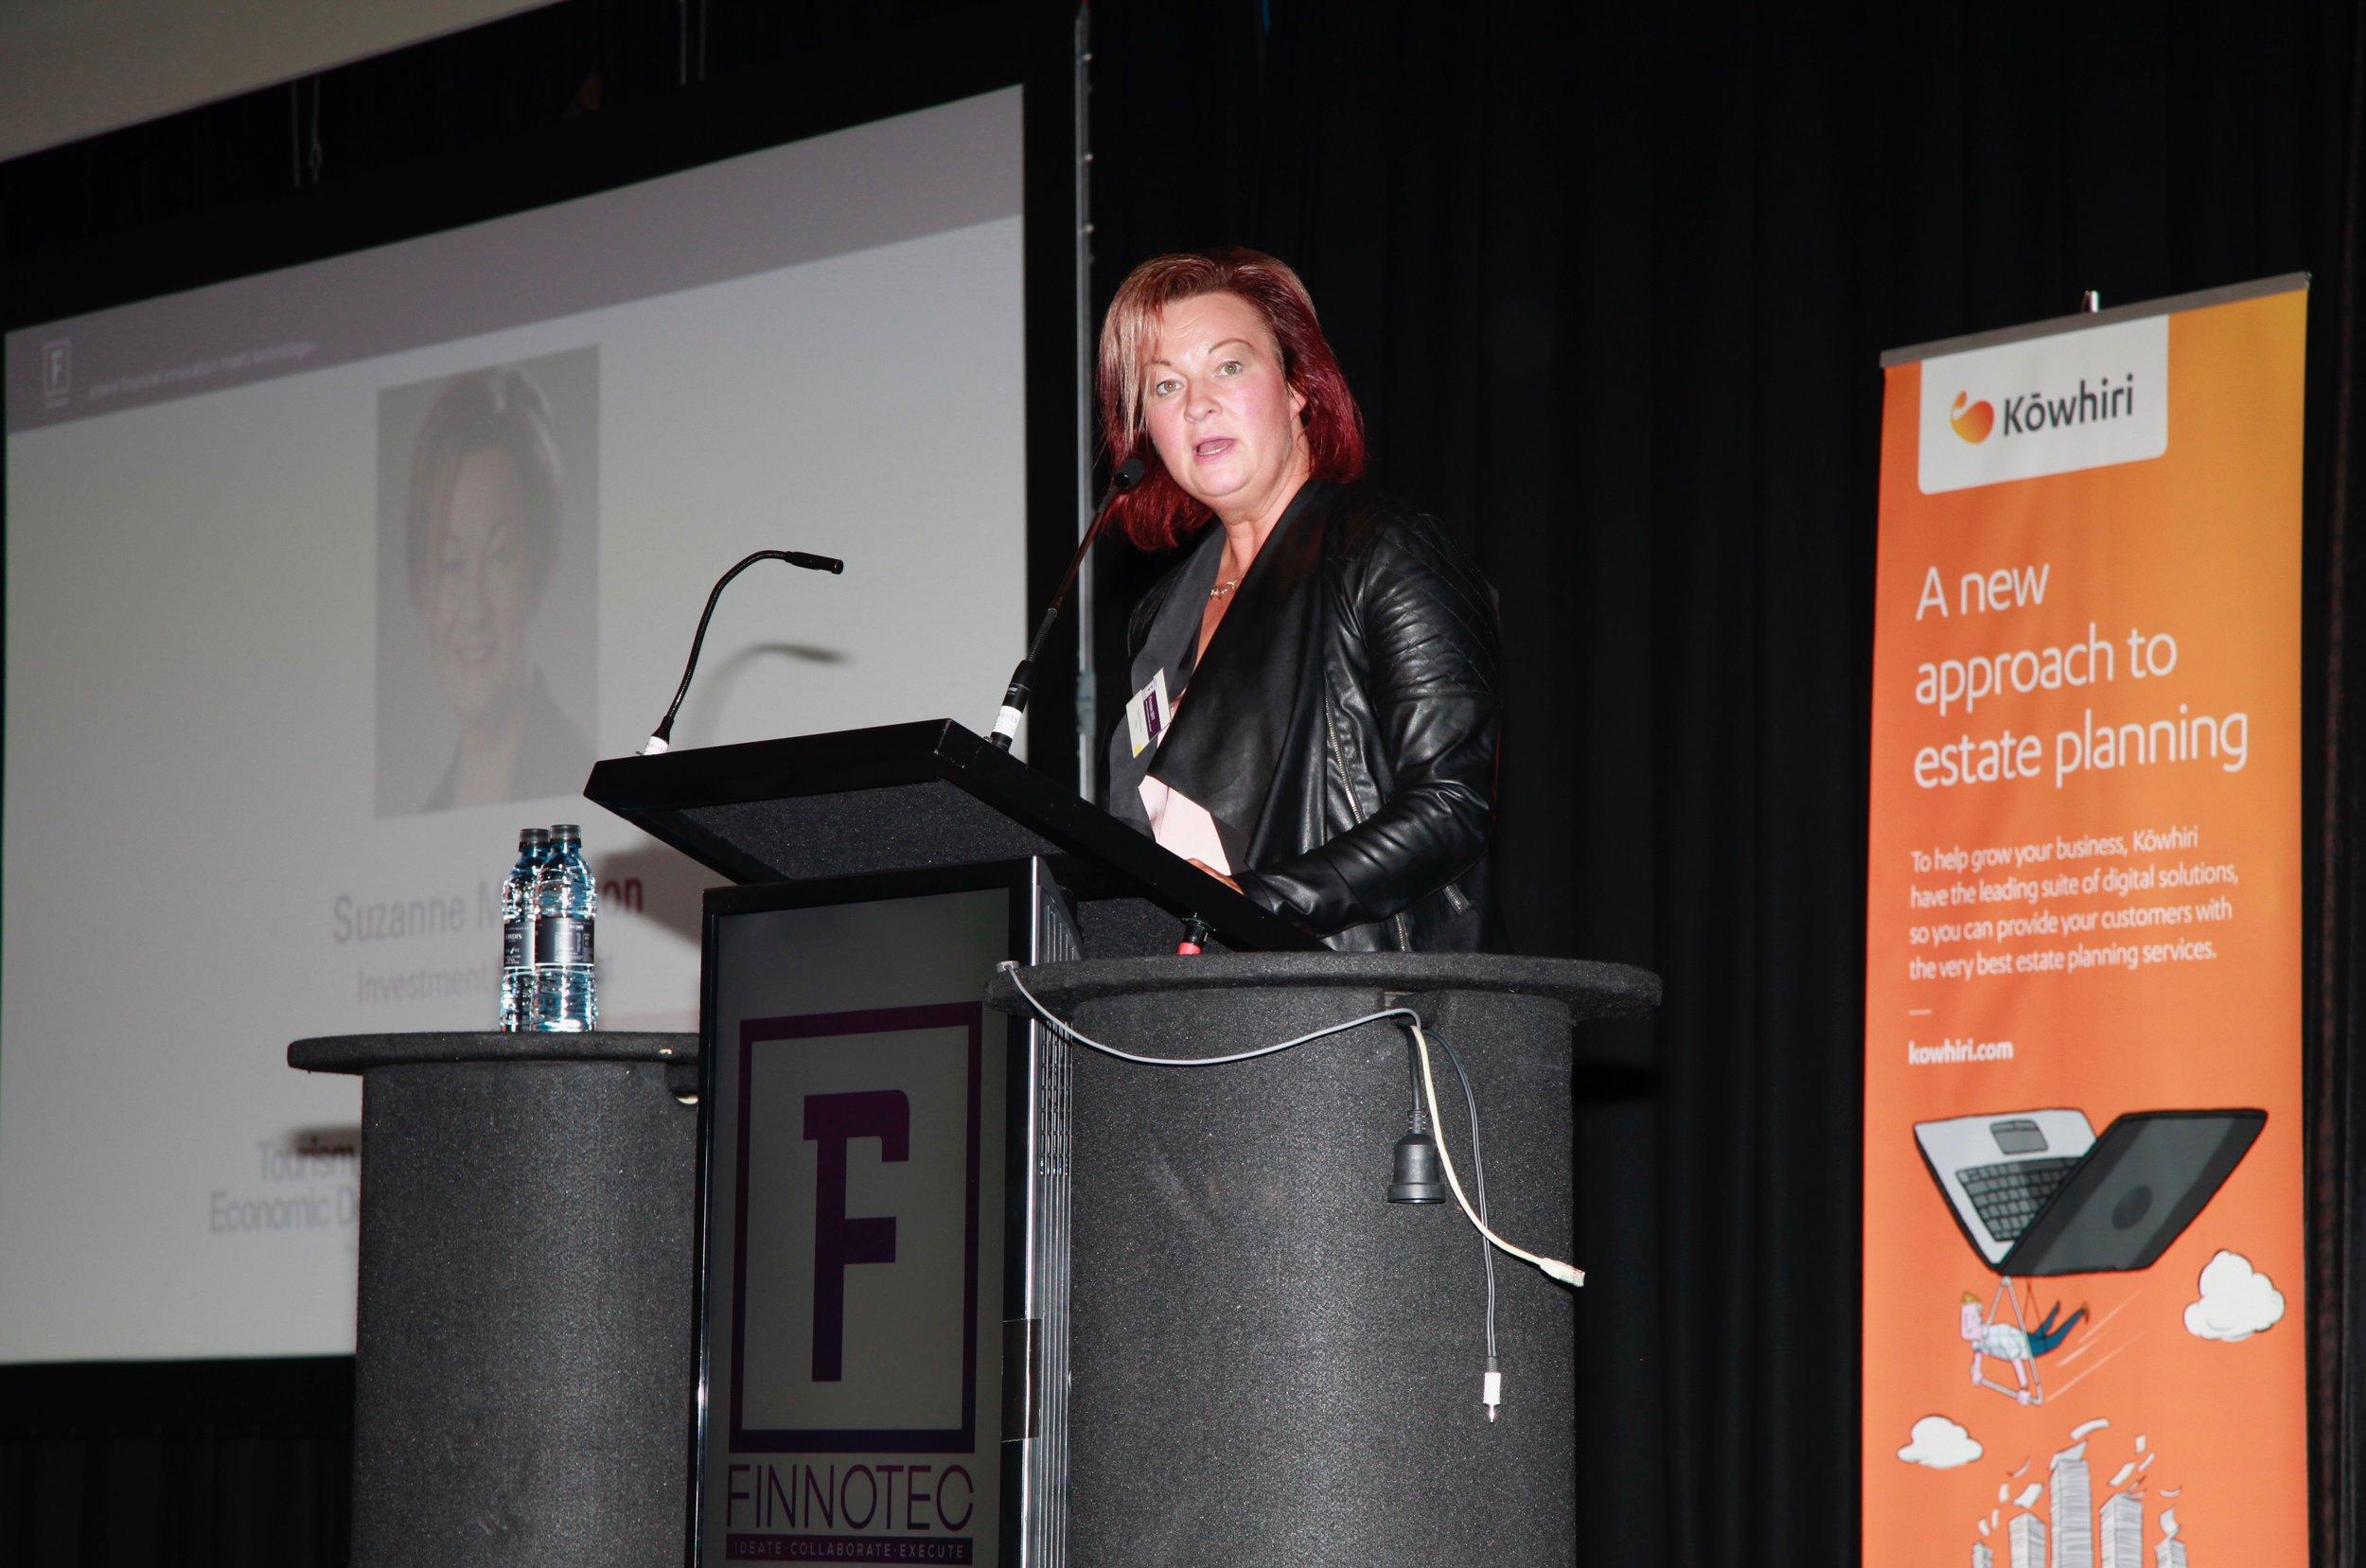 Suzanne McKinnon, Investment Director, ATEED